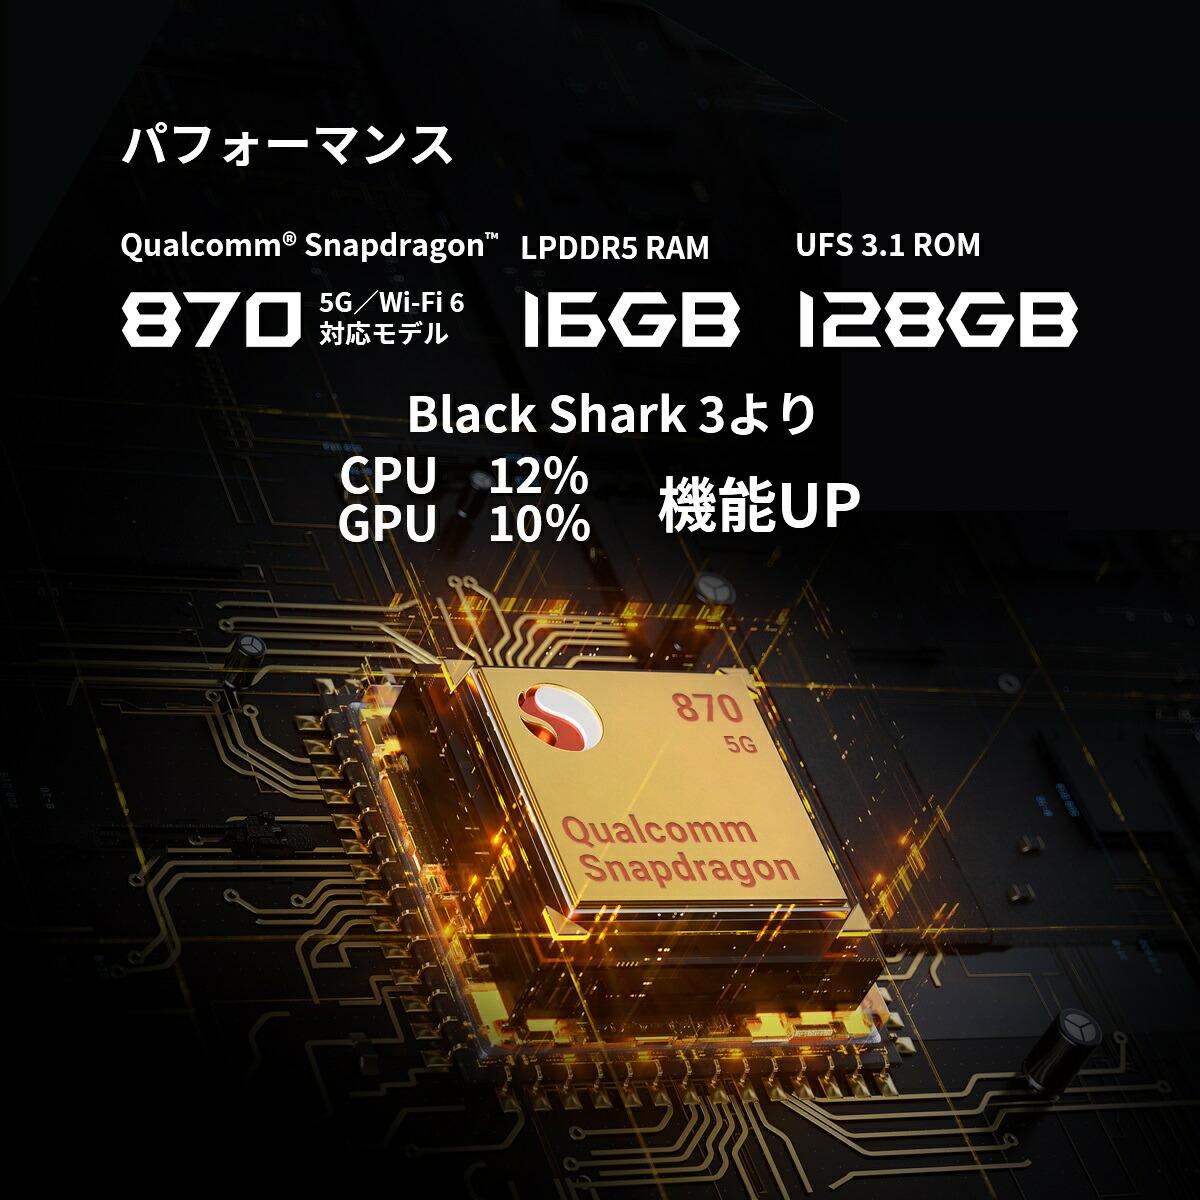 blackshark4ハイスペックモバイルスマートフォンe-スポーツを勝ち抜く